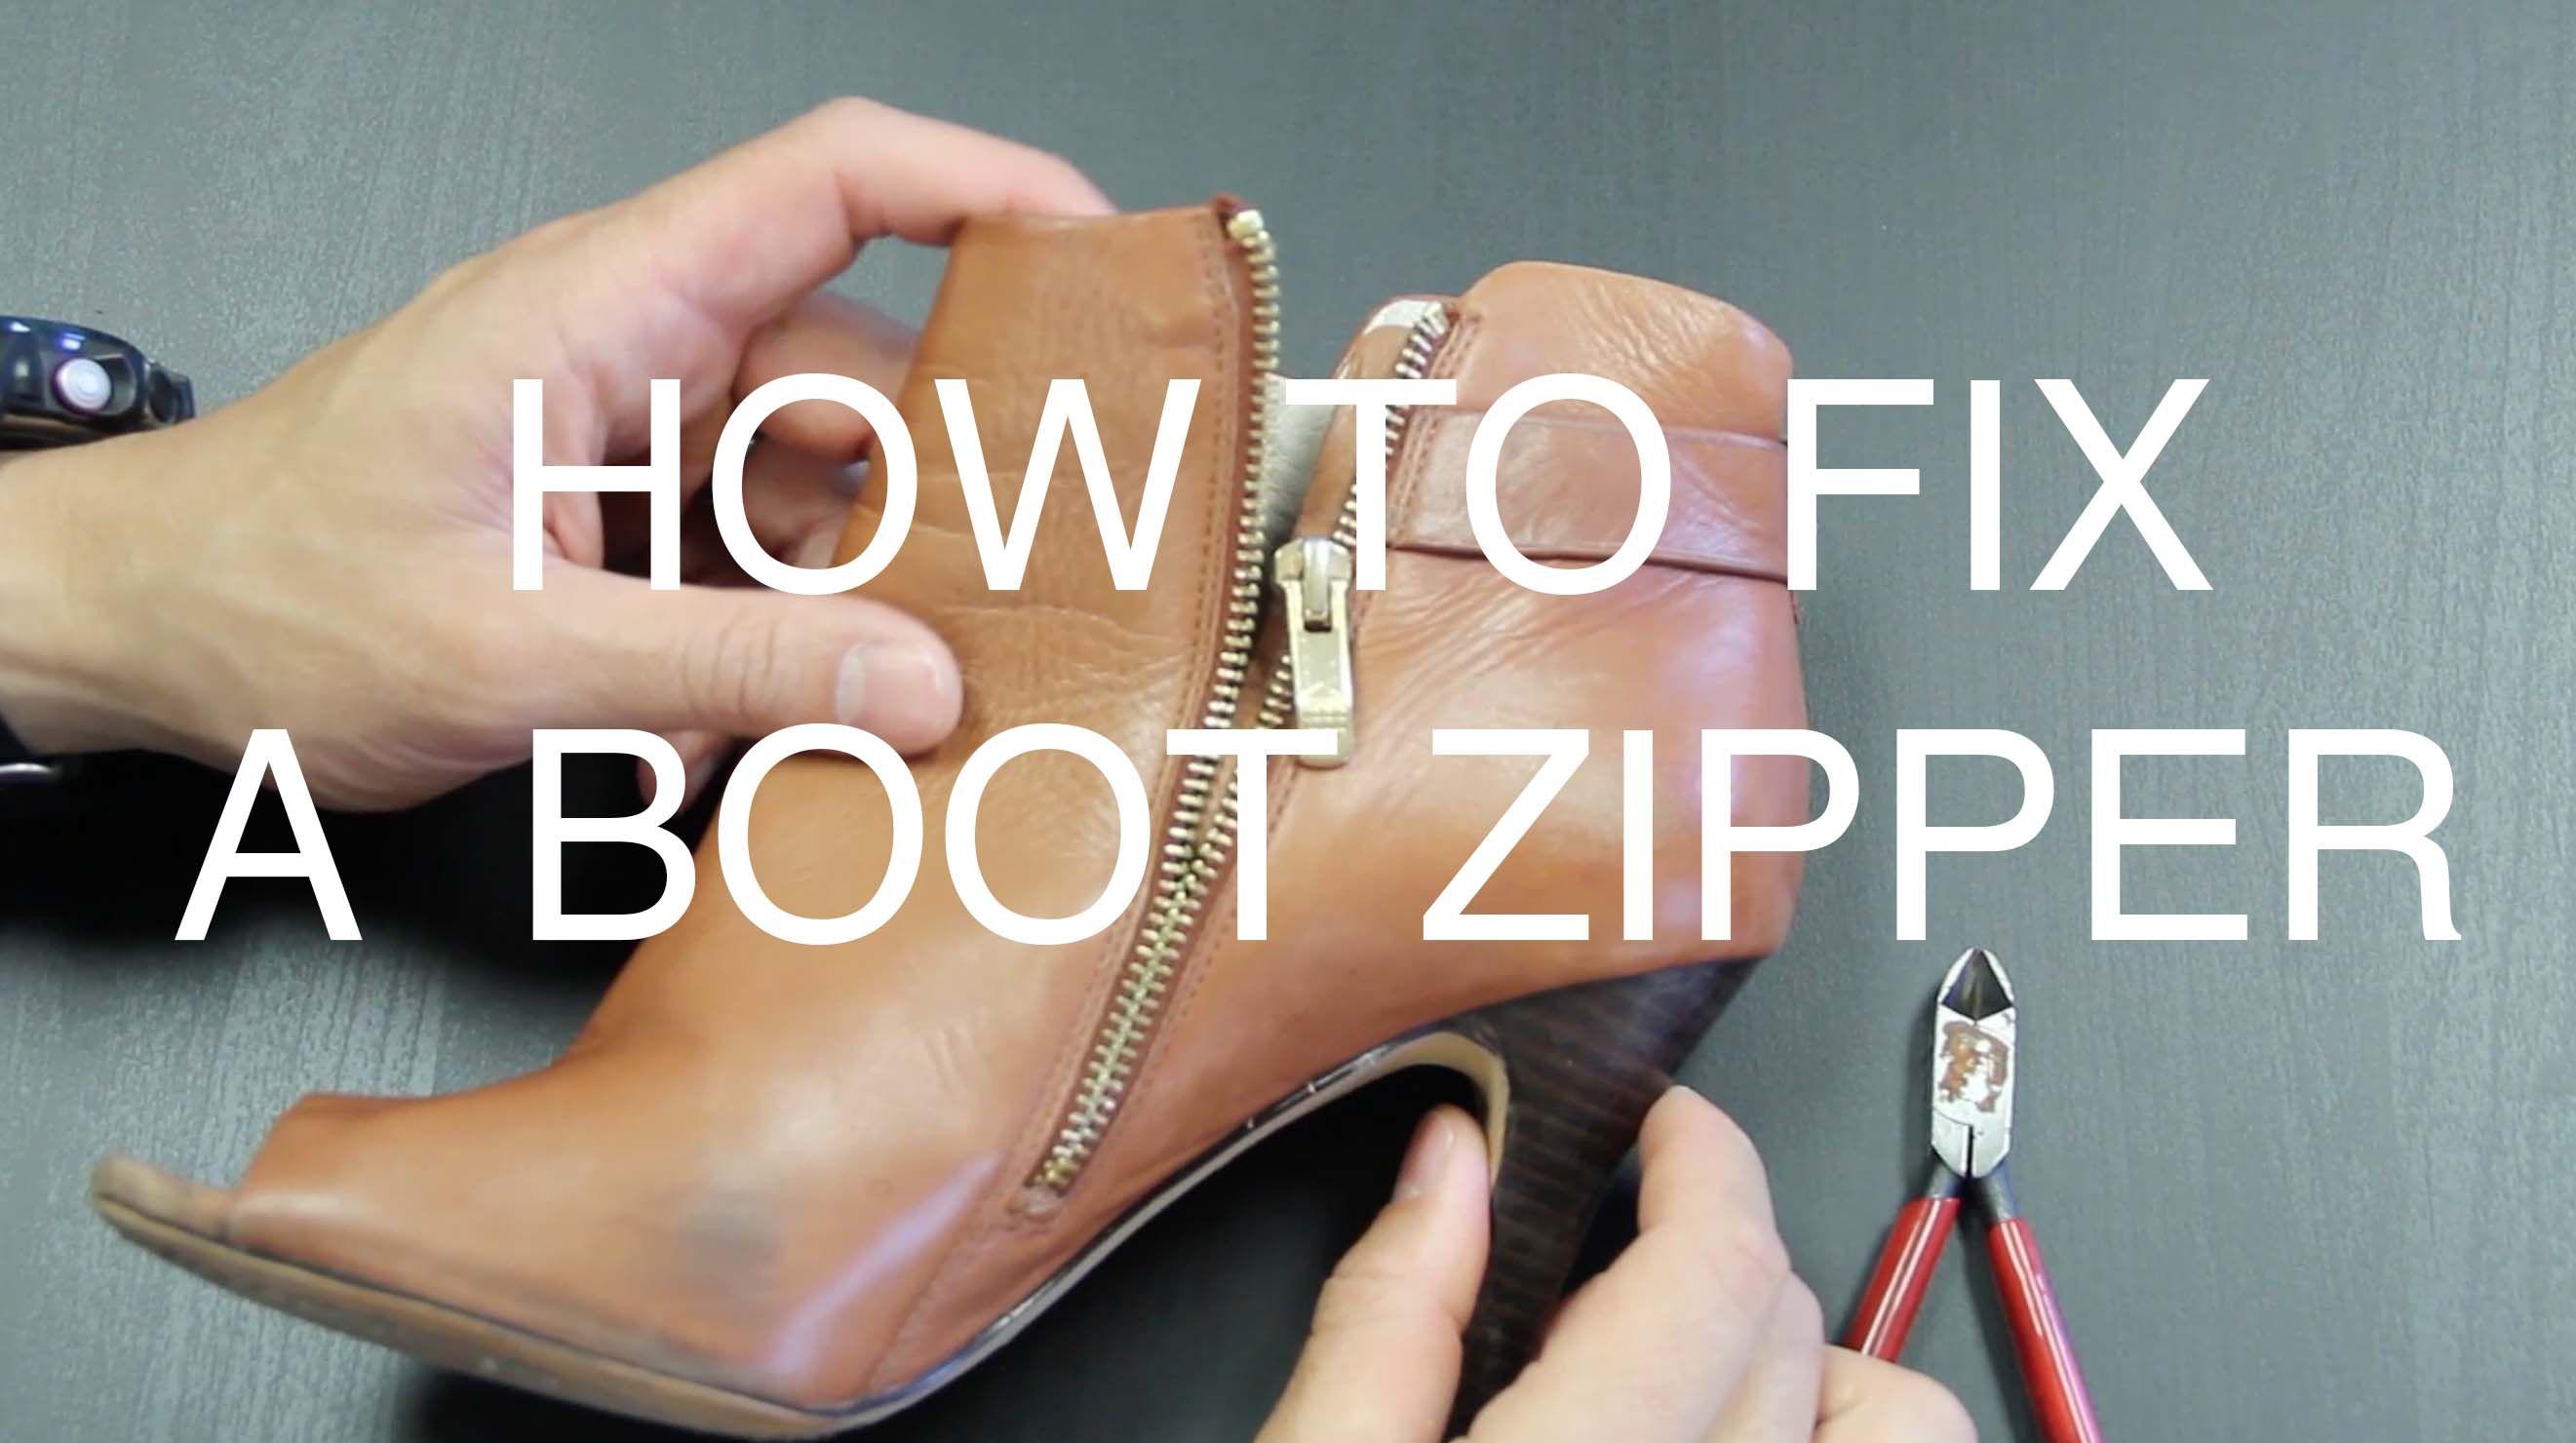 How to fix a boot zipper fix a zipper fix broken zipper